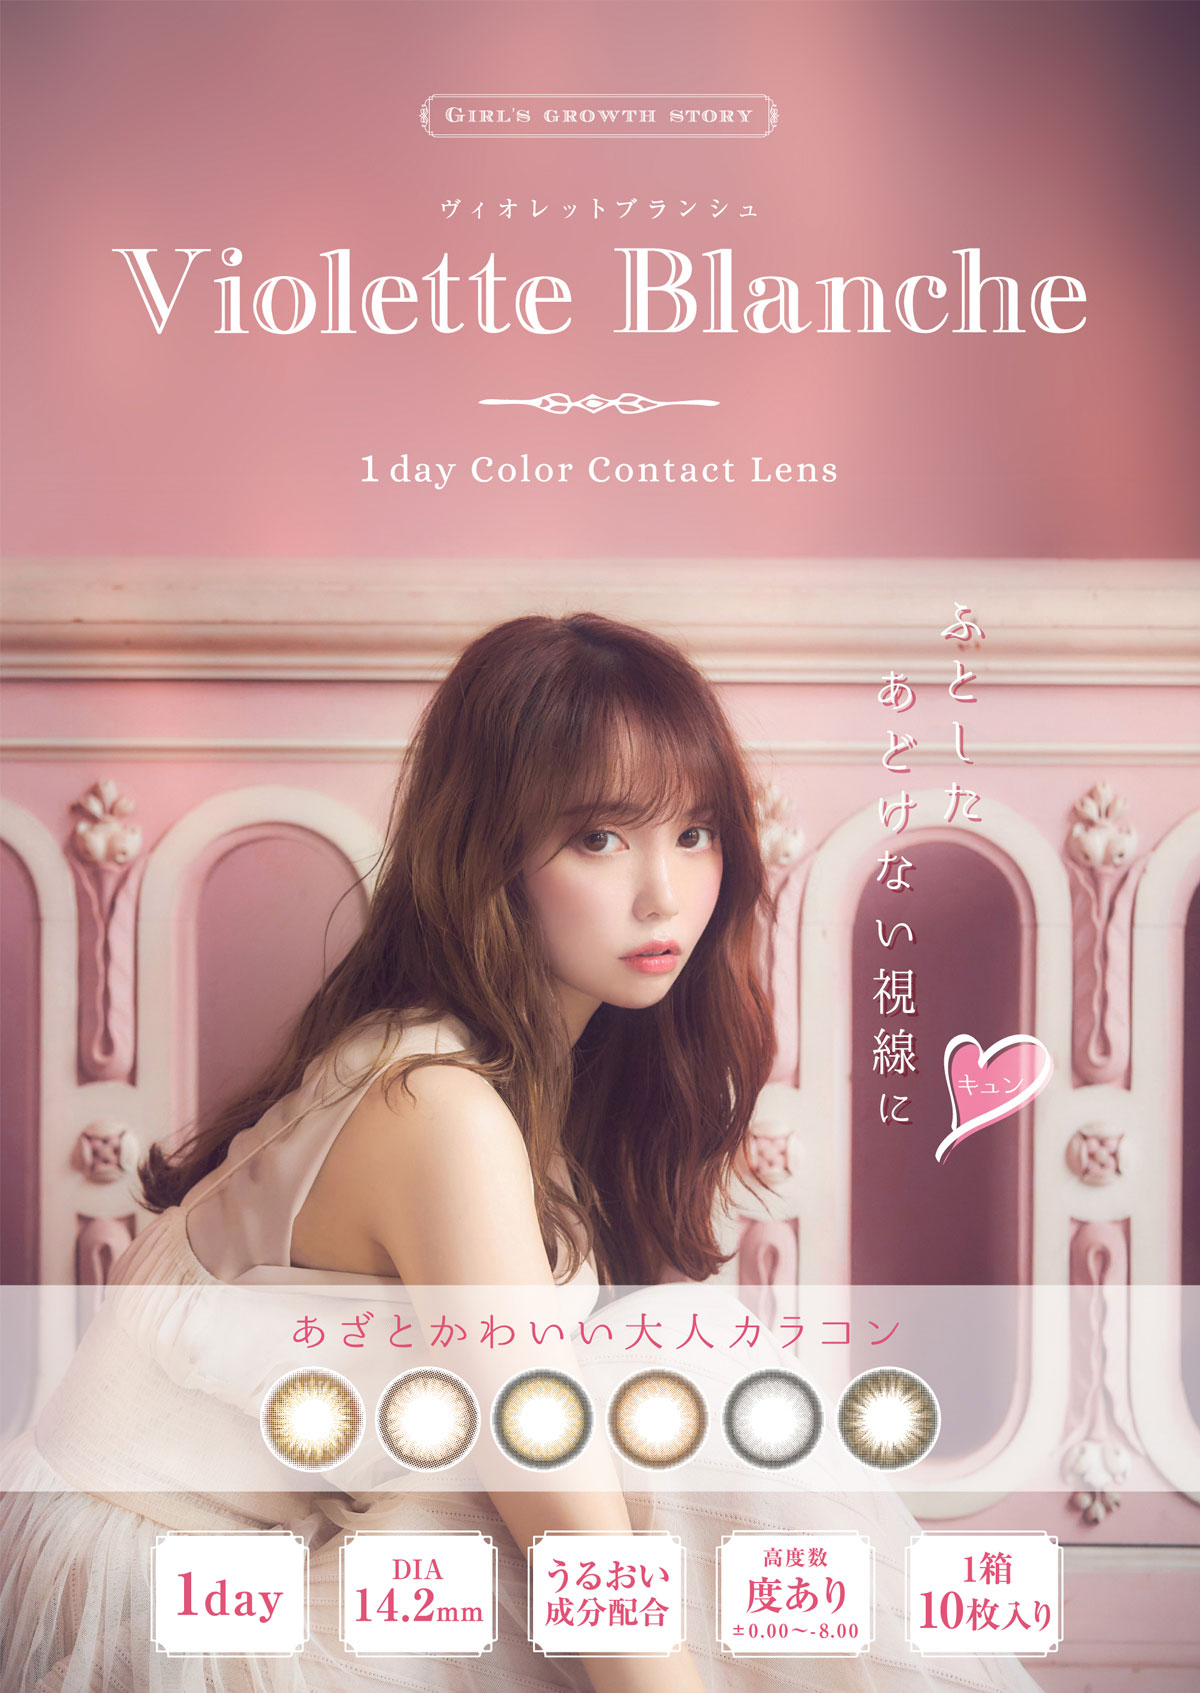 Violette Blanche ヴィオレットブランシュメイン画像 コスプレカラコン通販アイトルテ